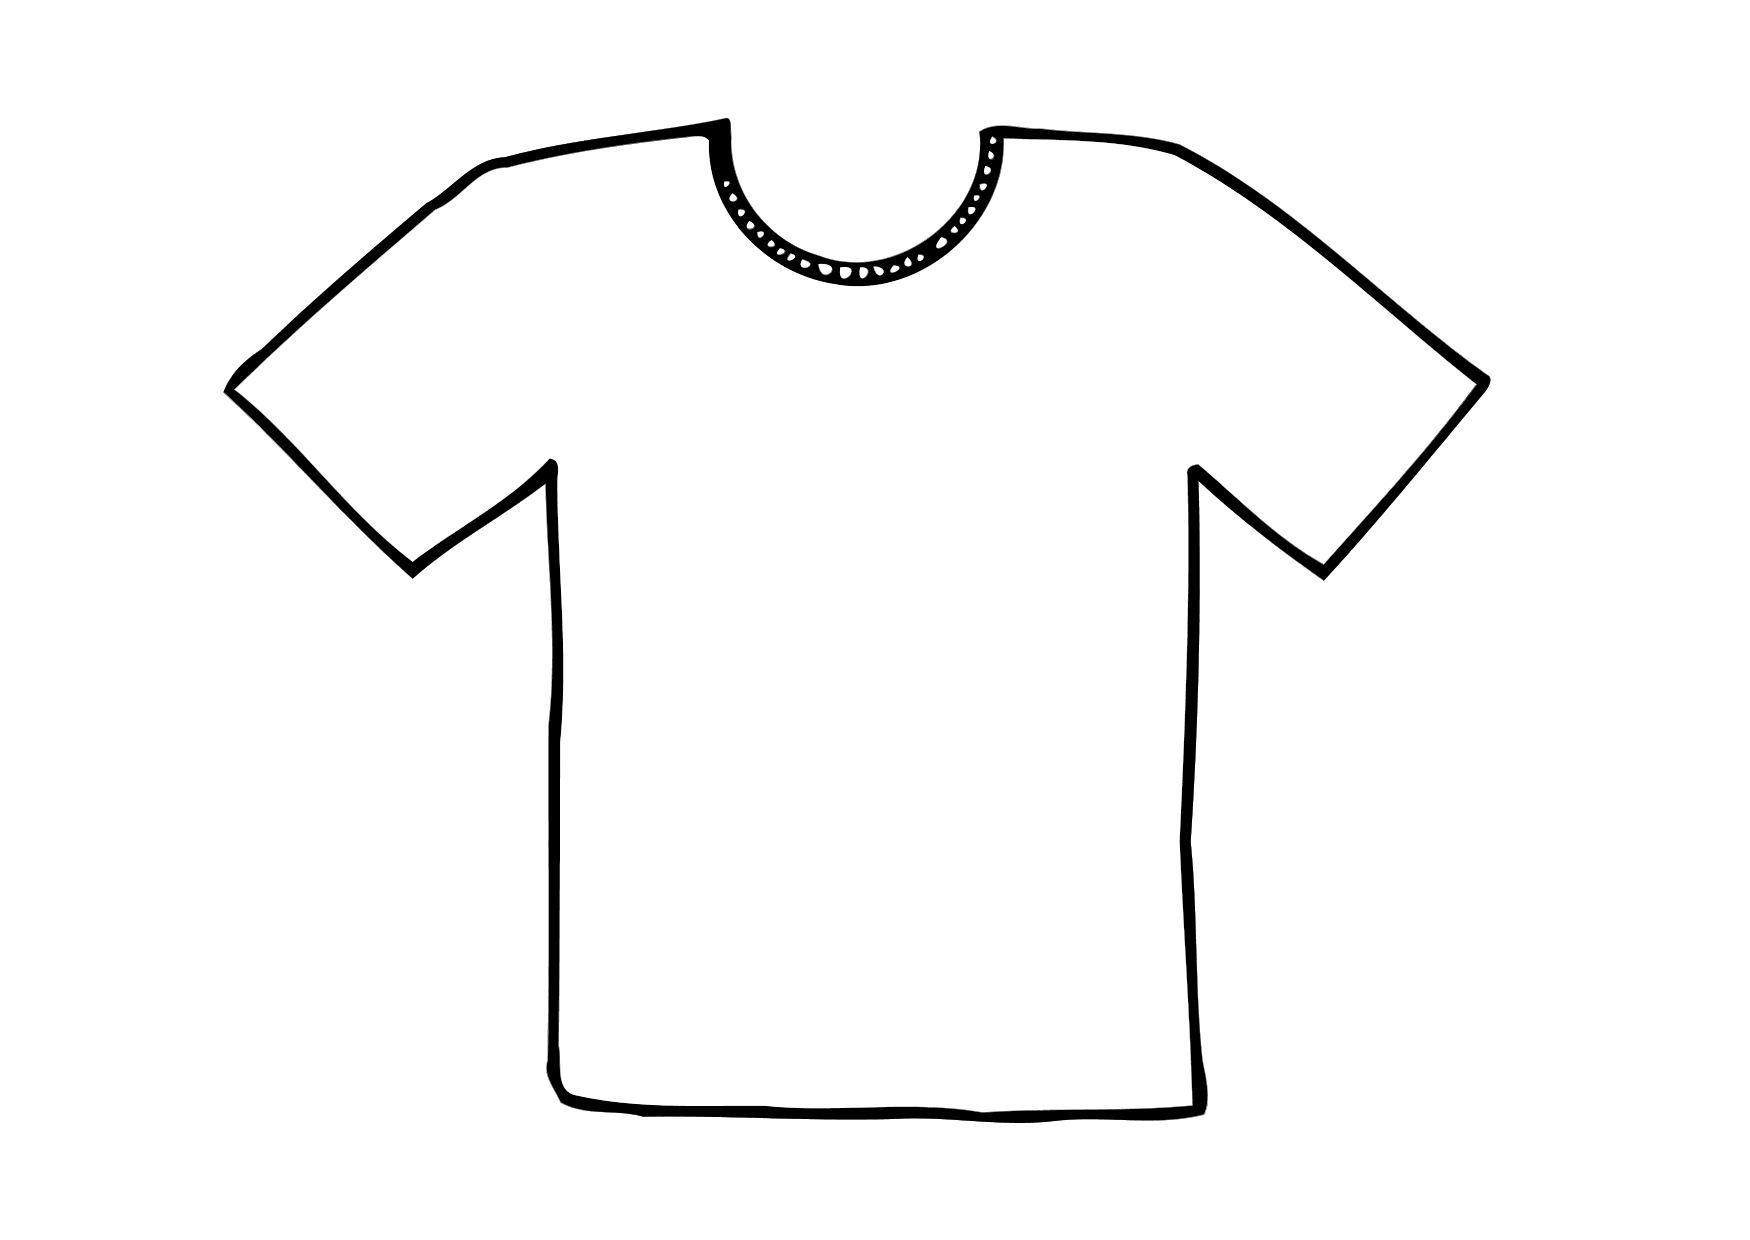 Dibujo para colorear Camiseta [431x305]